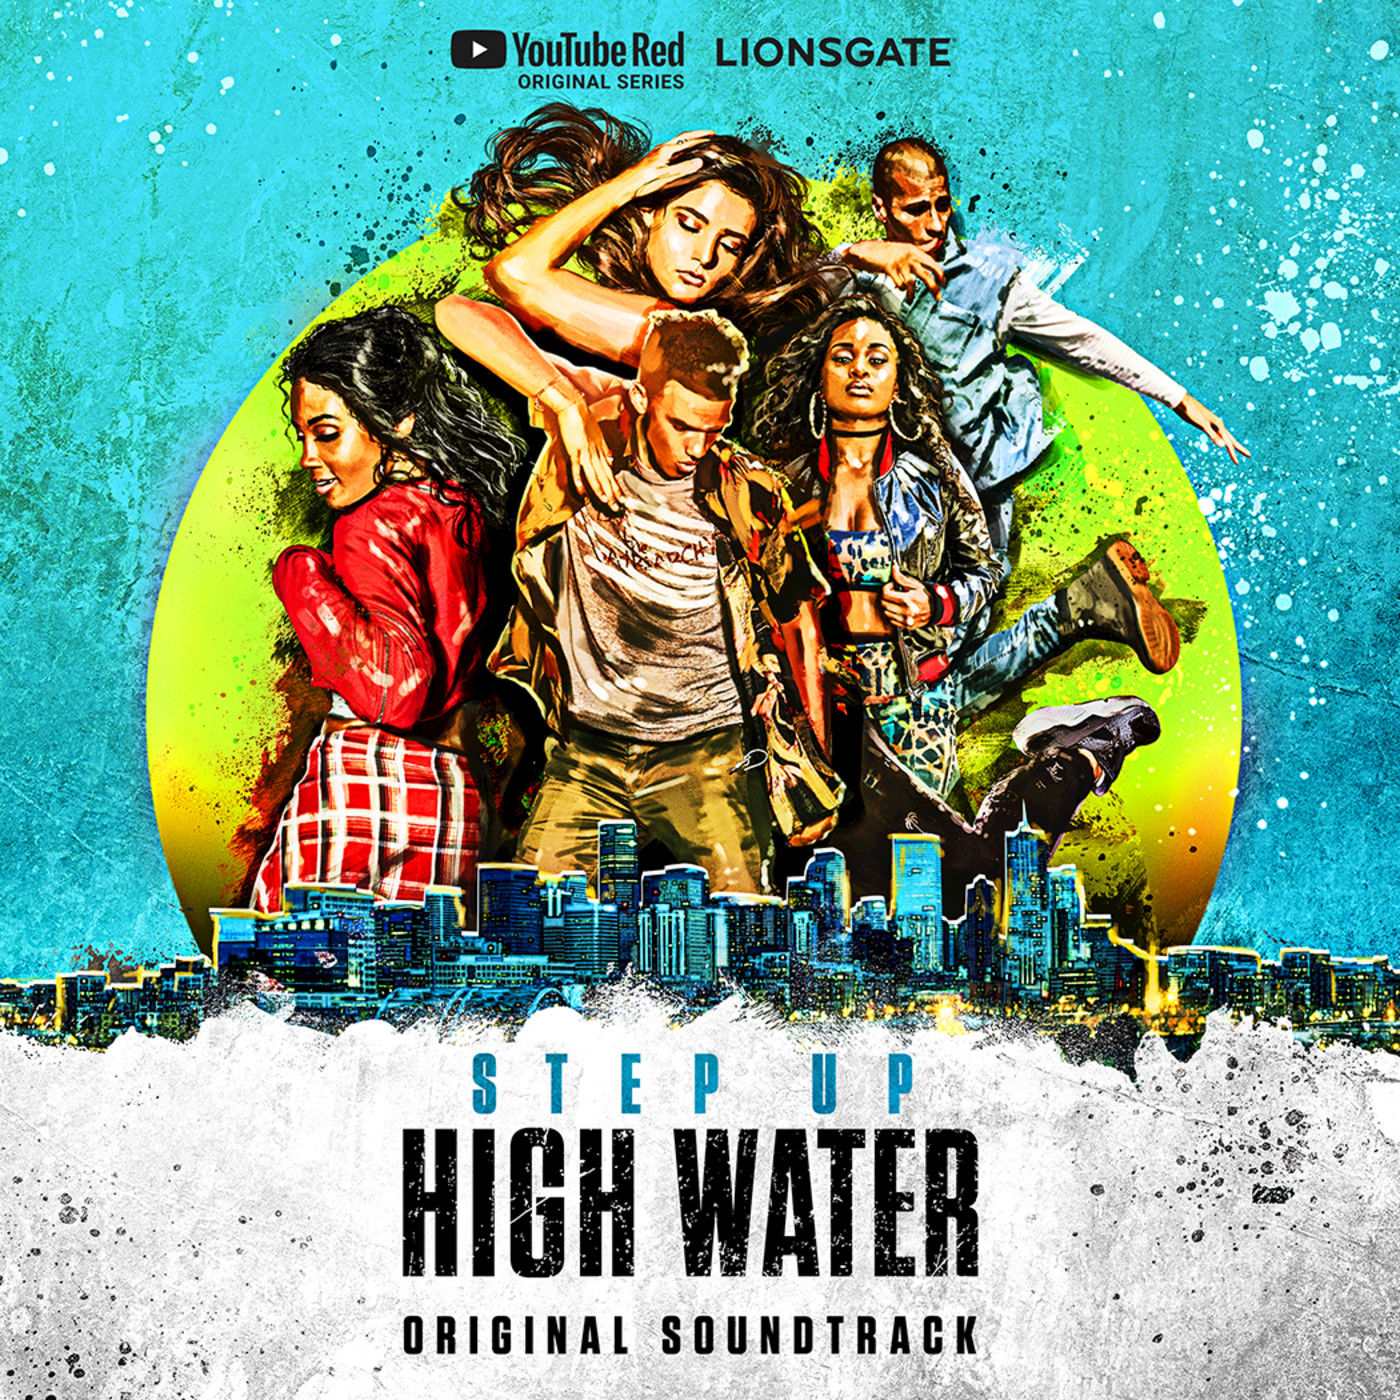 Step Up: High Water - Big (feat. Ne-Yo) - Single Cover